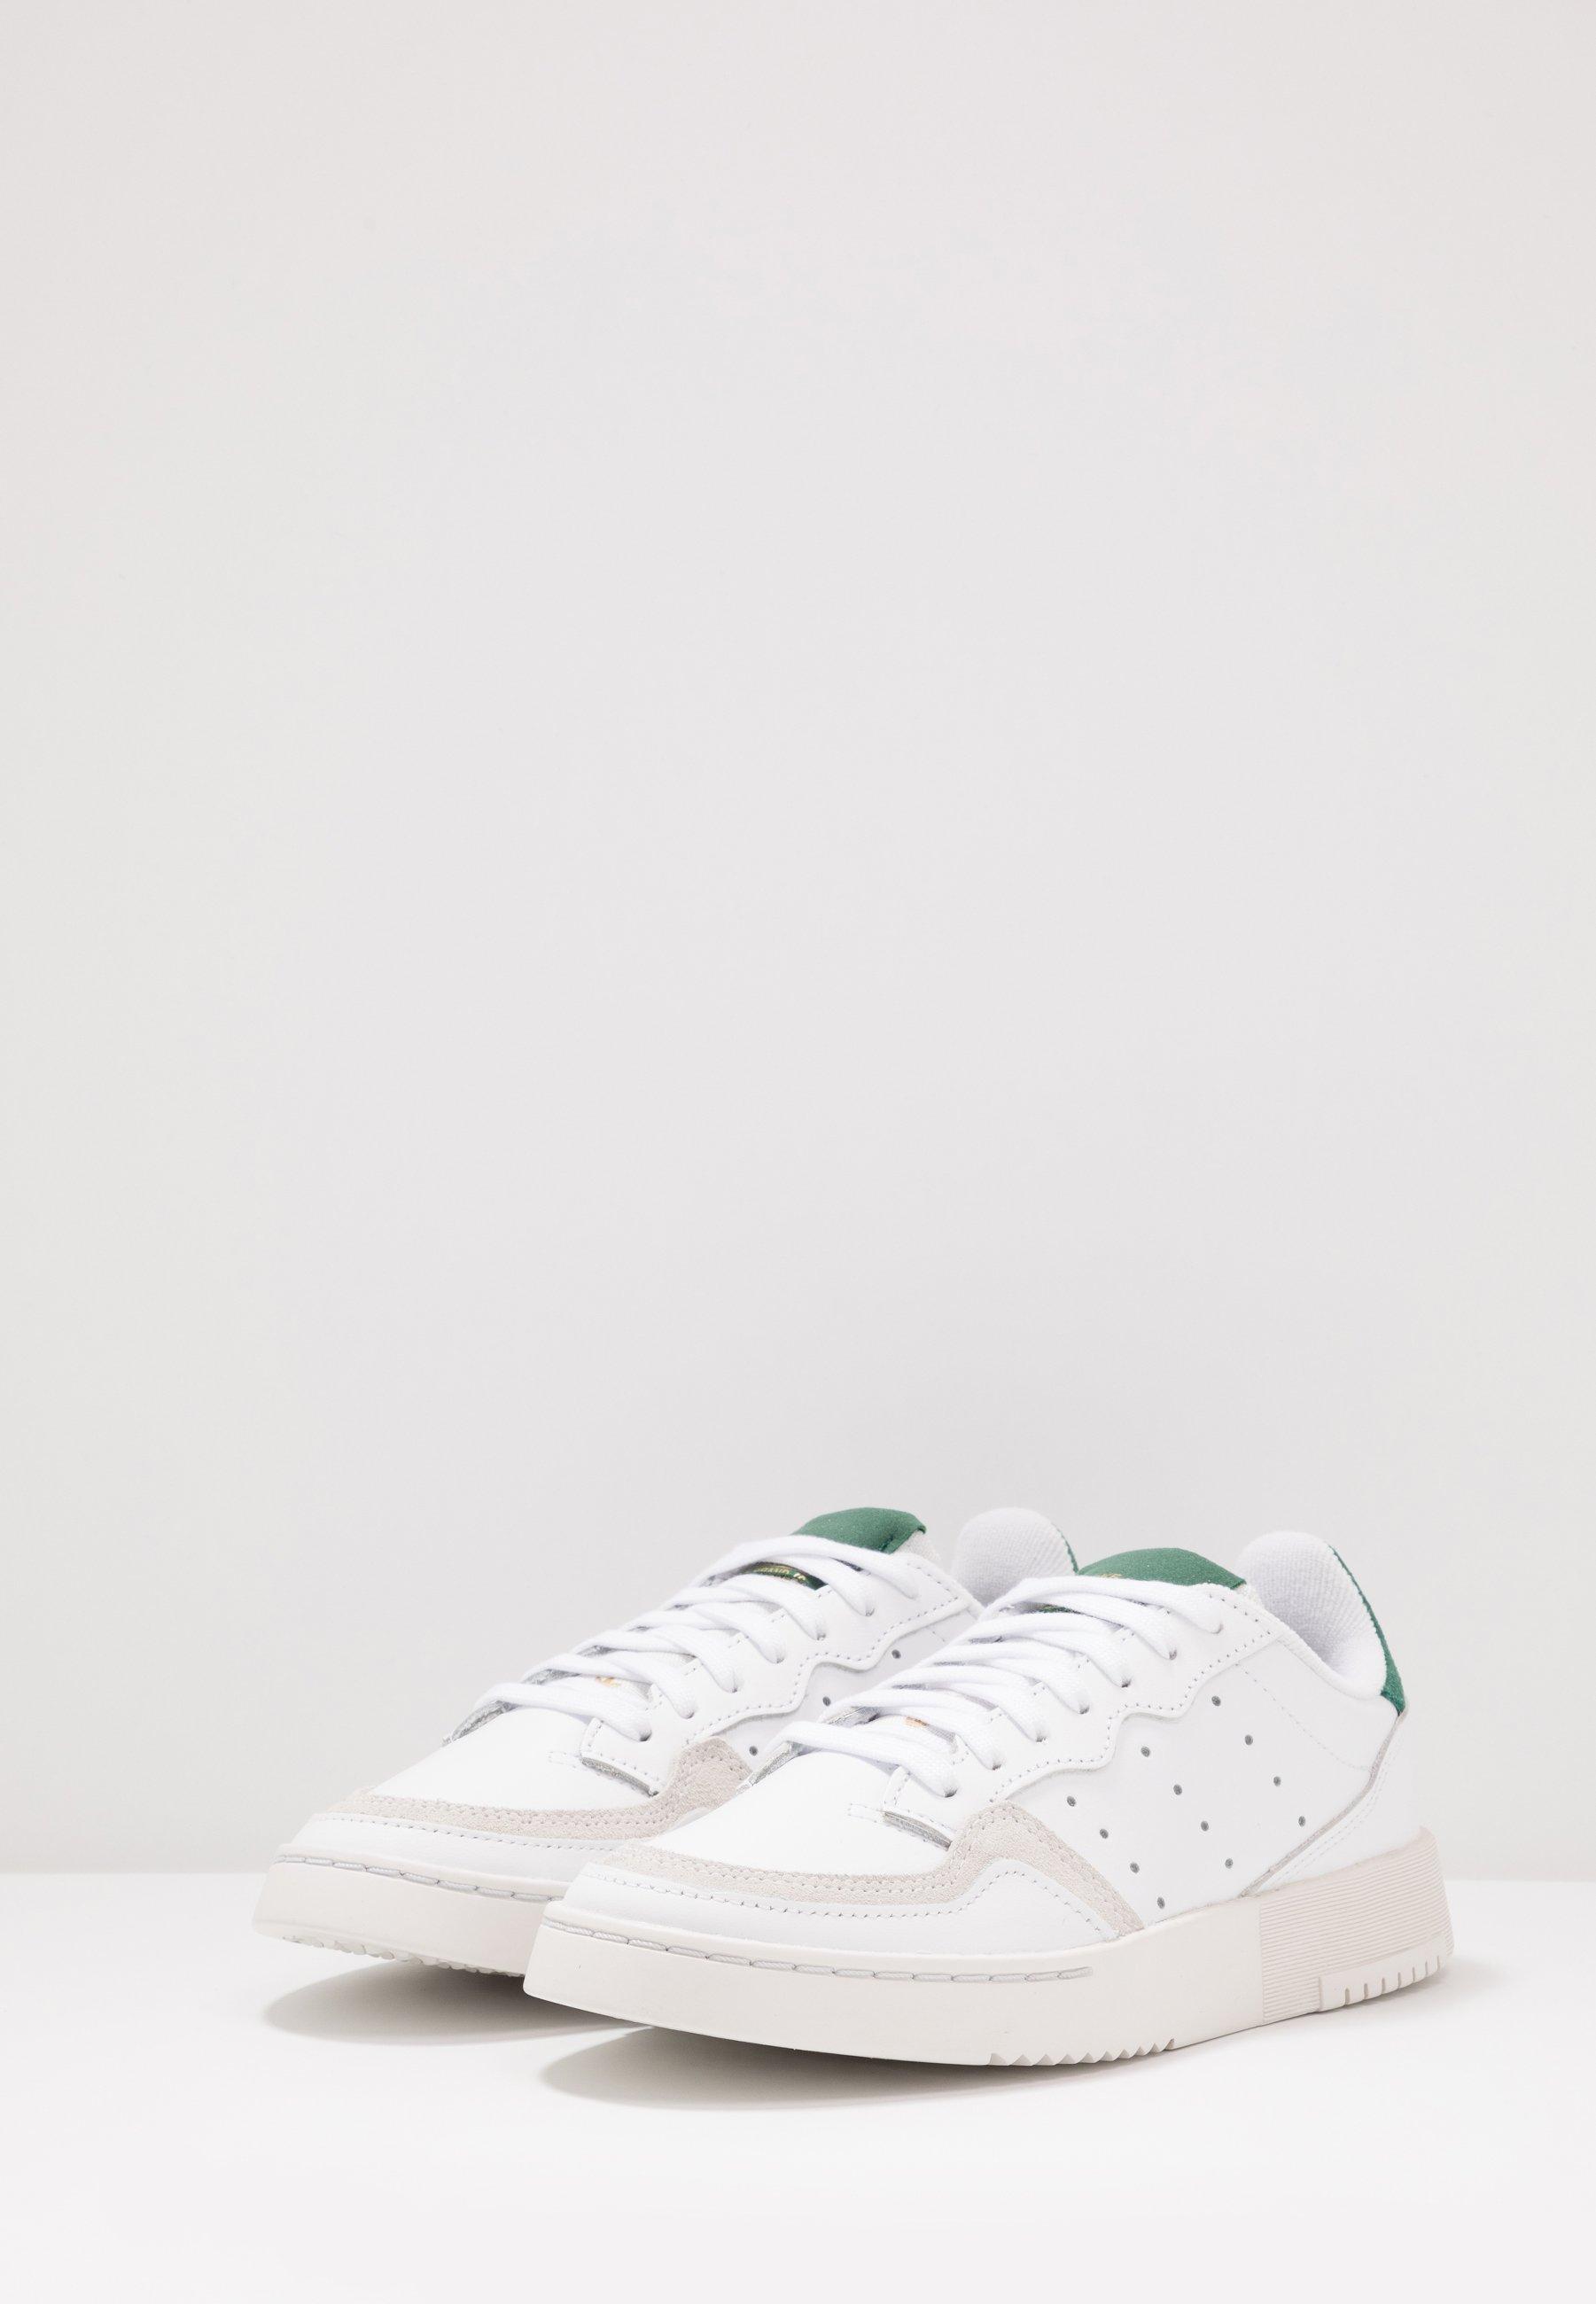 Adidas Originals Supercourt - Sneakers Basse Footwear White/collegiate Green 1rw5mY6